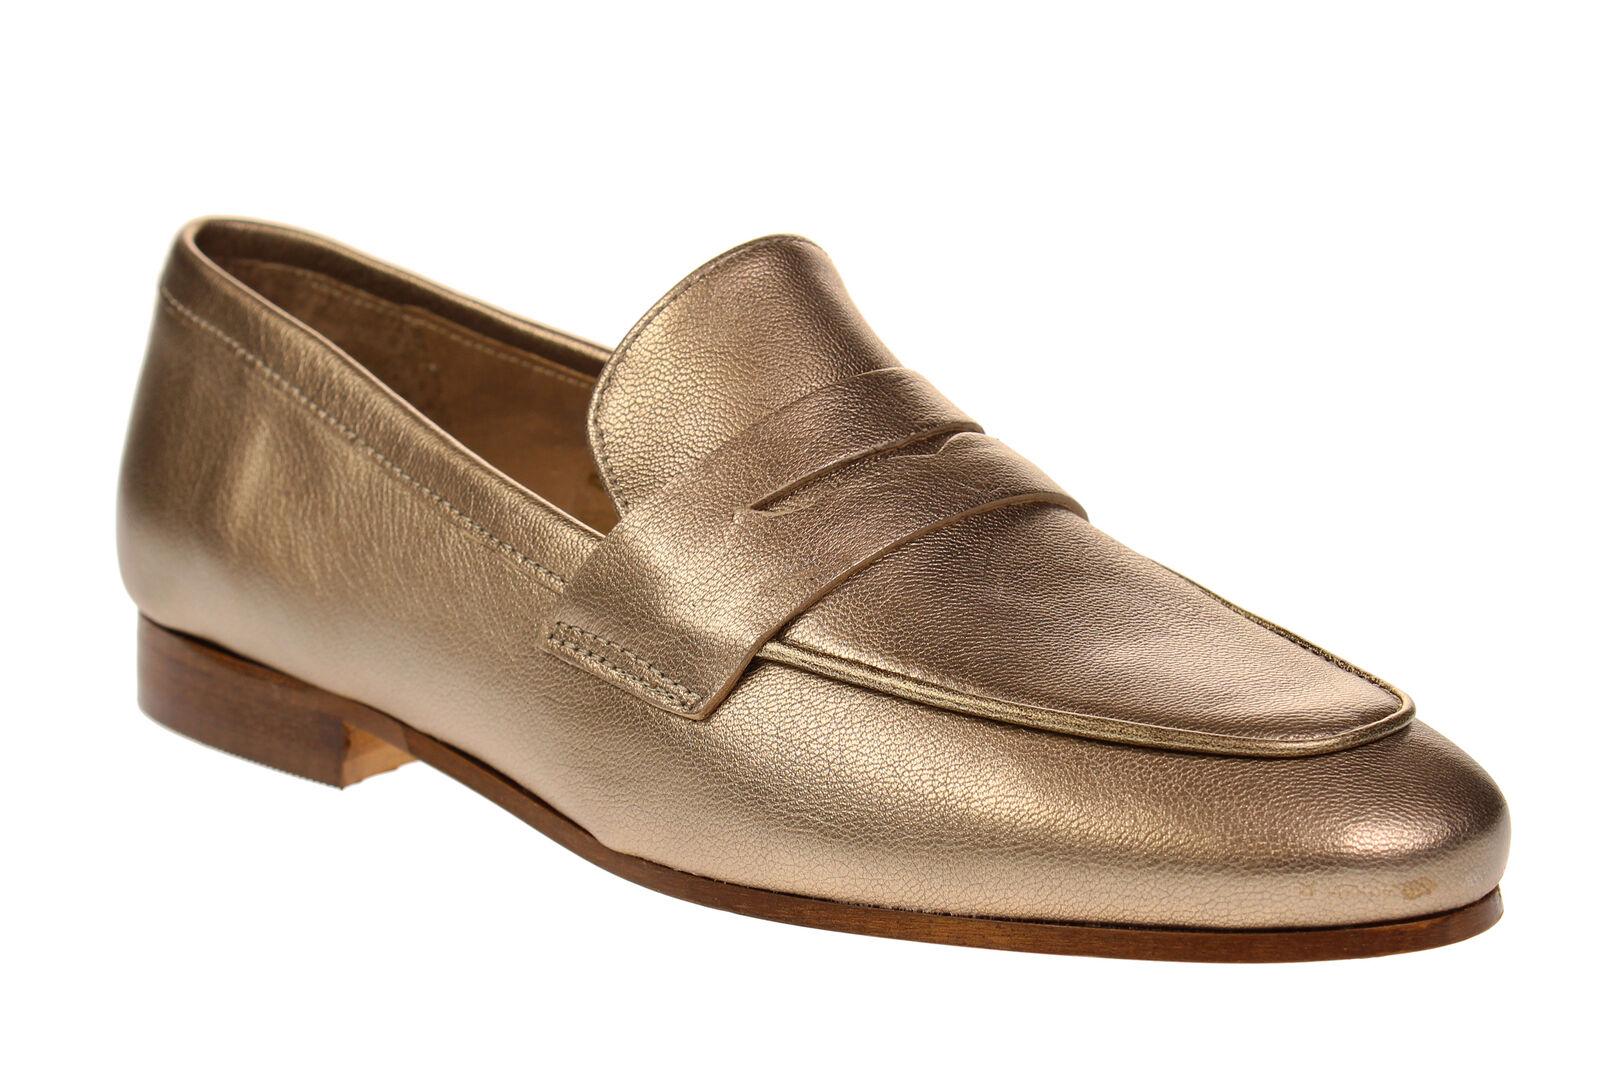 Post Xchange NERU01 - Damen Schuhe Freizeitschuhe Slipper - 9130